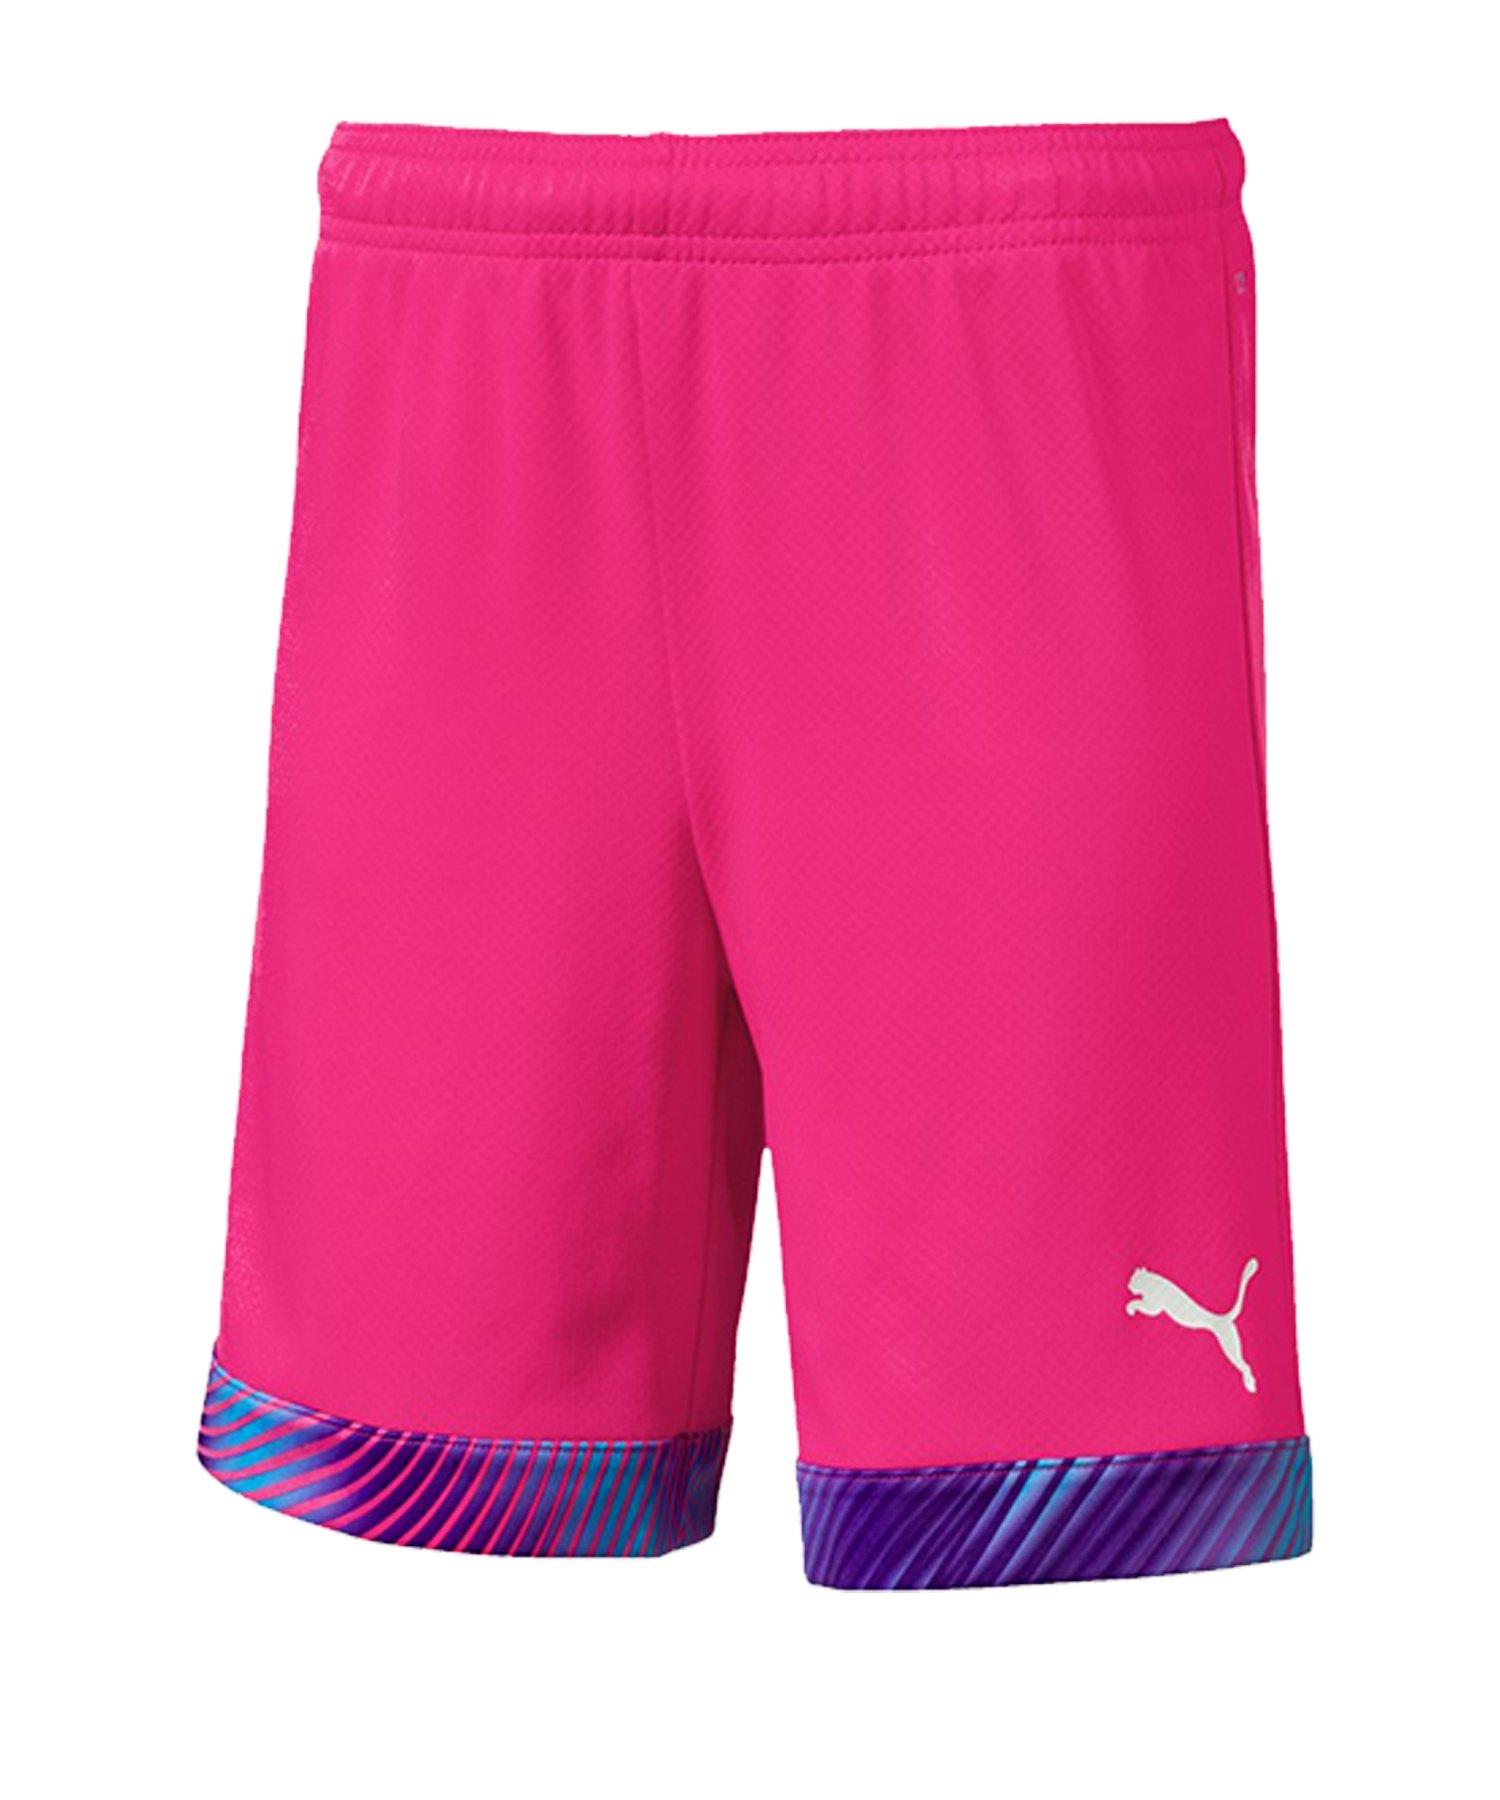 PUMA CUP Short Kids Pink Lila Weiss F41 - pink